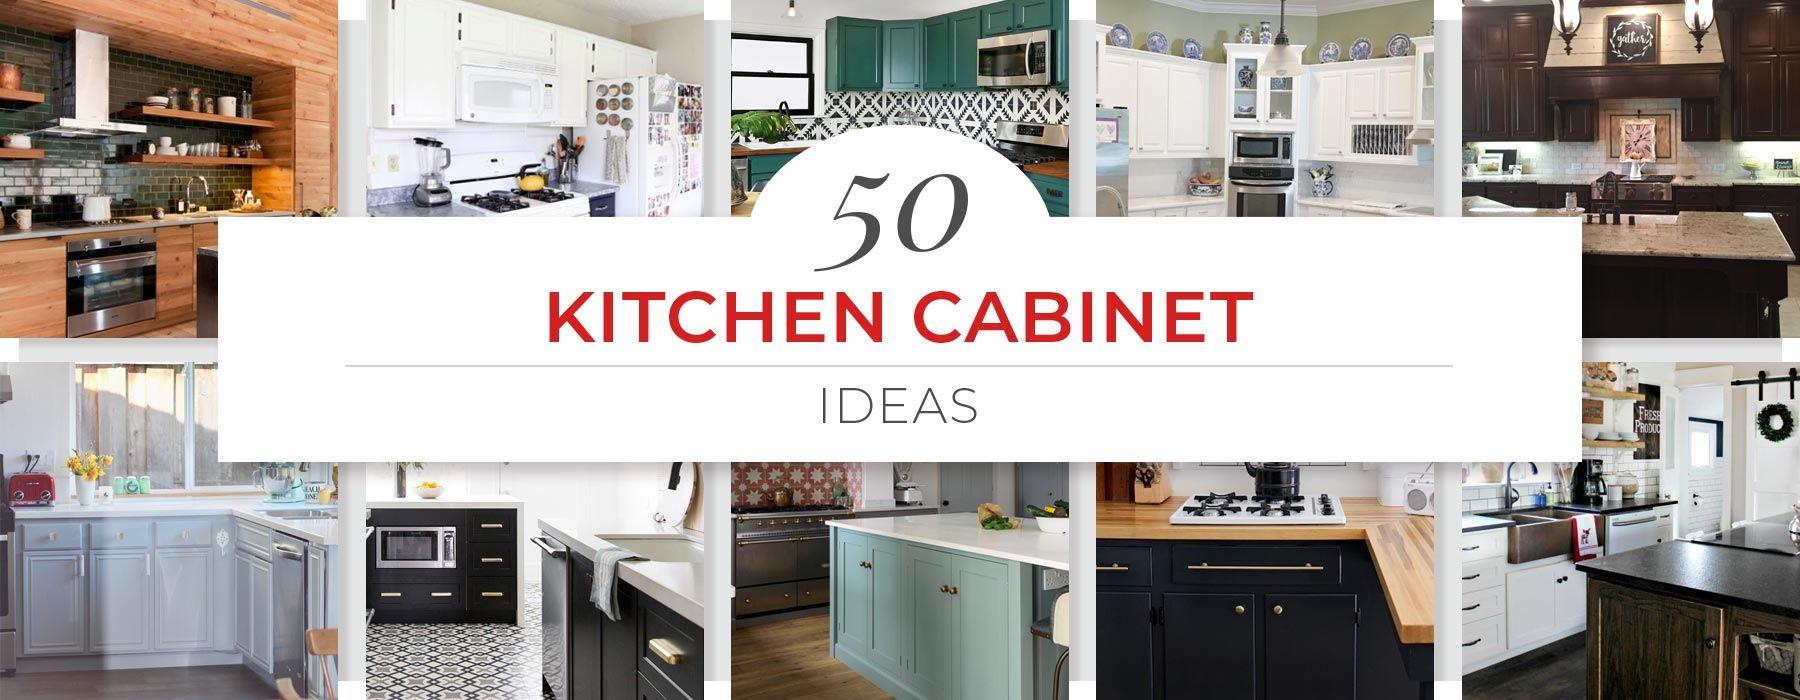 50 Kitchen Cabinet Ideas For 2019 Kitchen Cabinet Design House